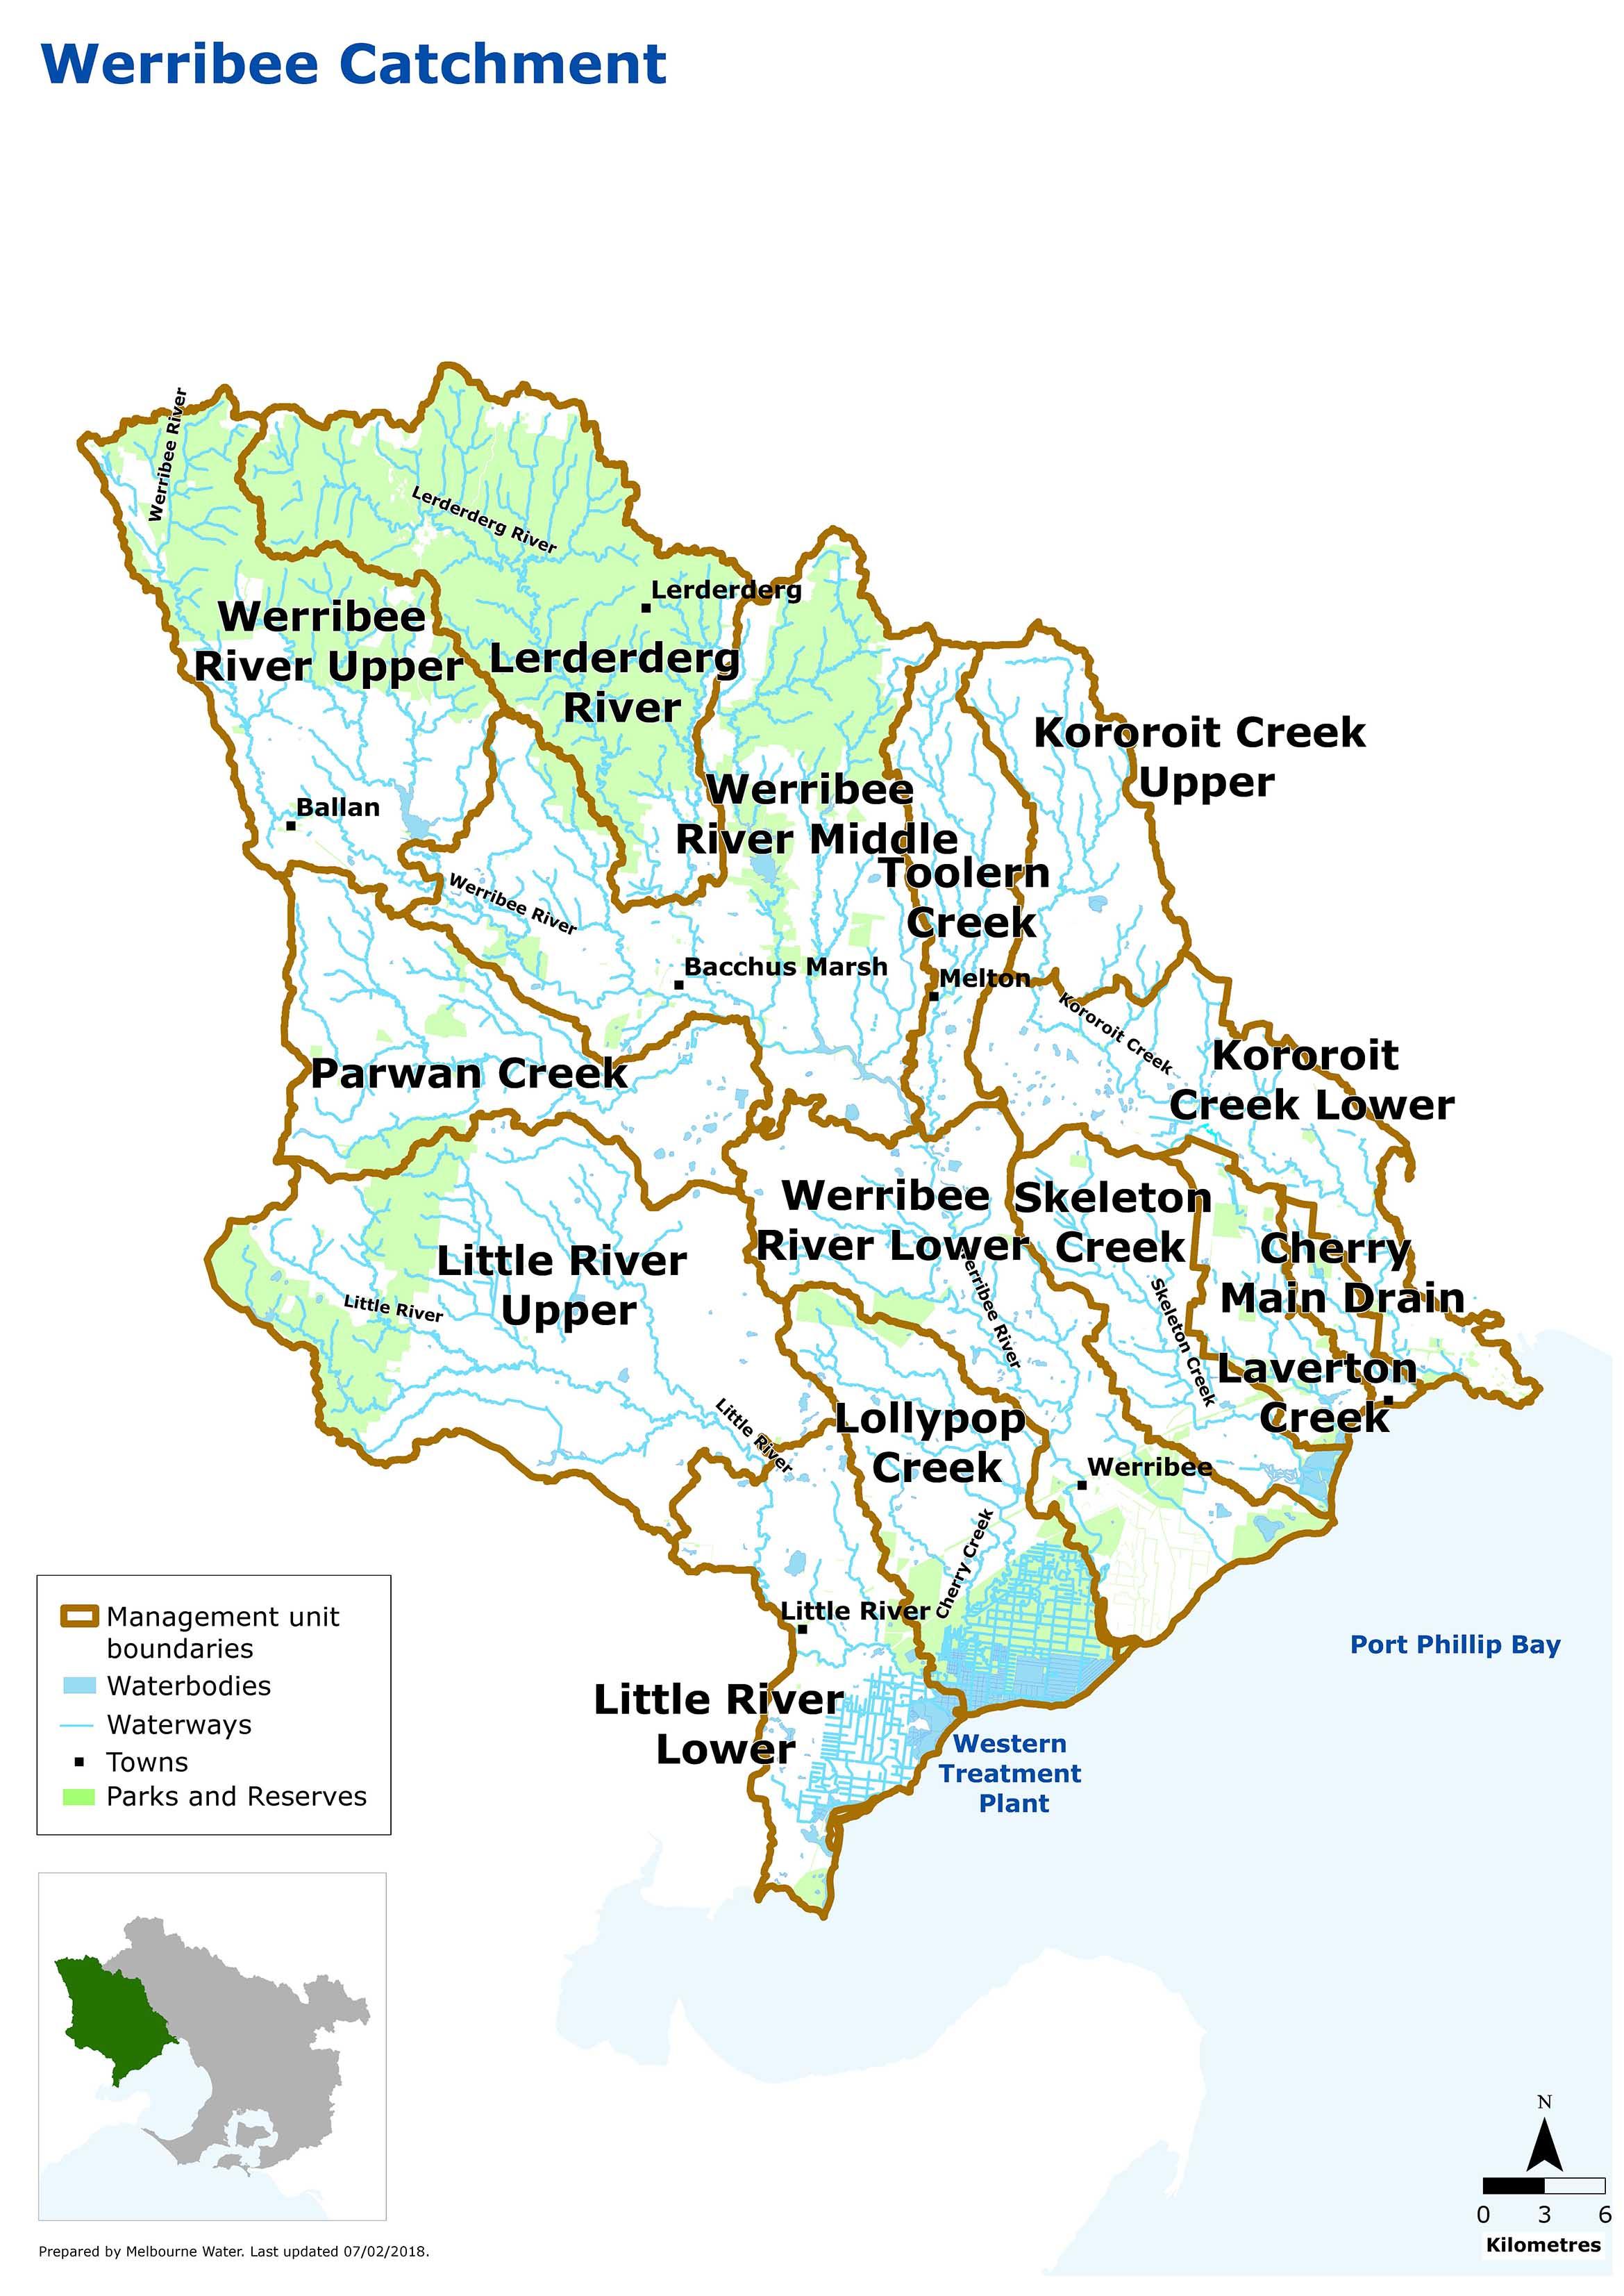 Map of Werribee Catchment